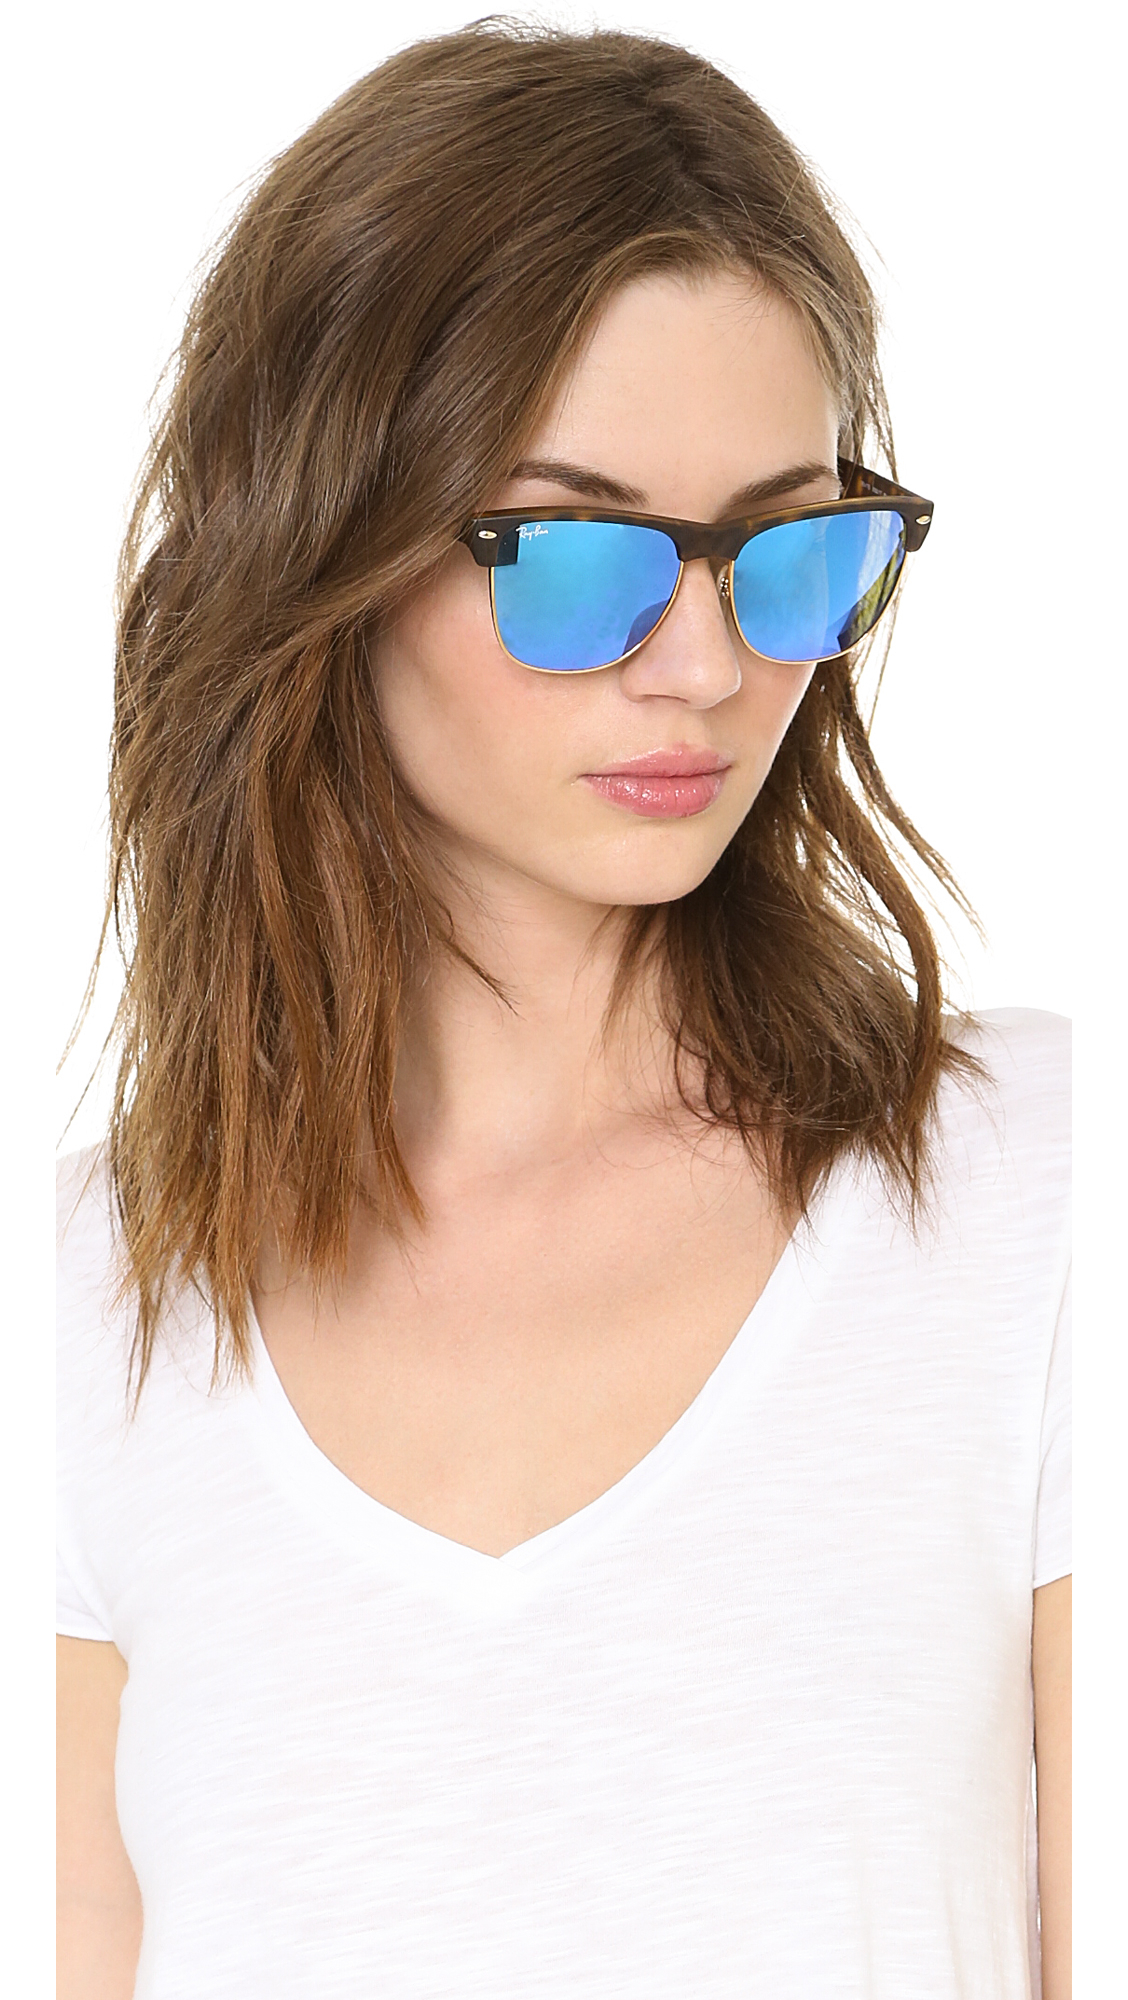 eb037881c8 Ray-Ban Mirrored Highstreet Sunglasses Matte Havanabrown Mirror Pink ...